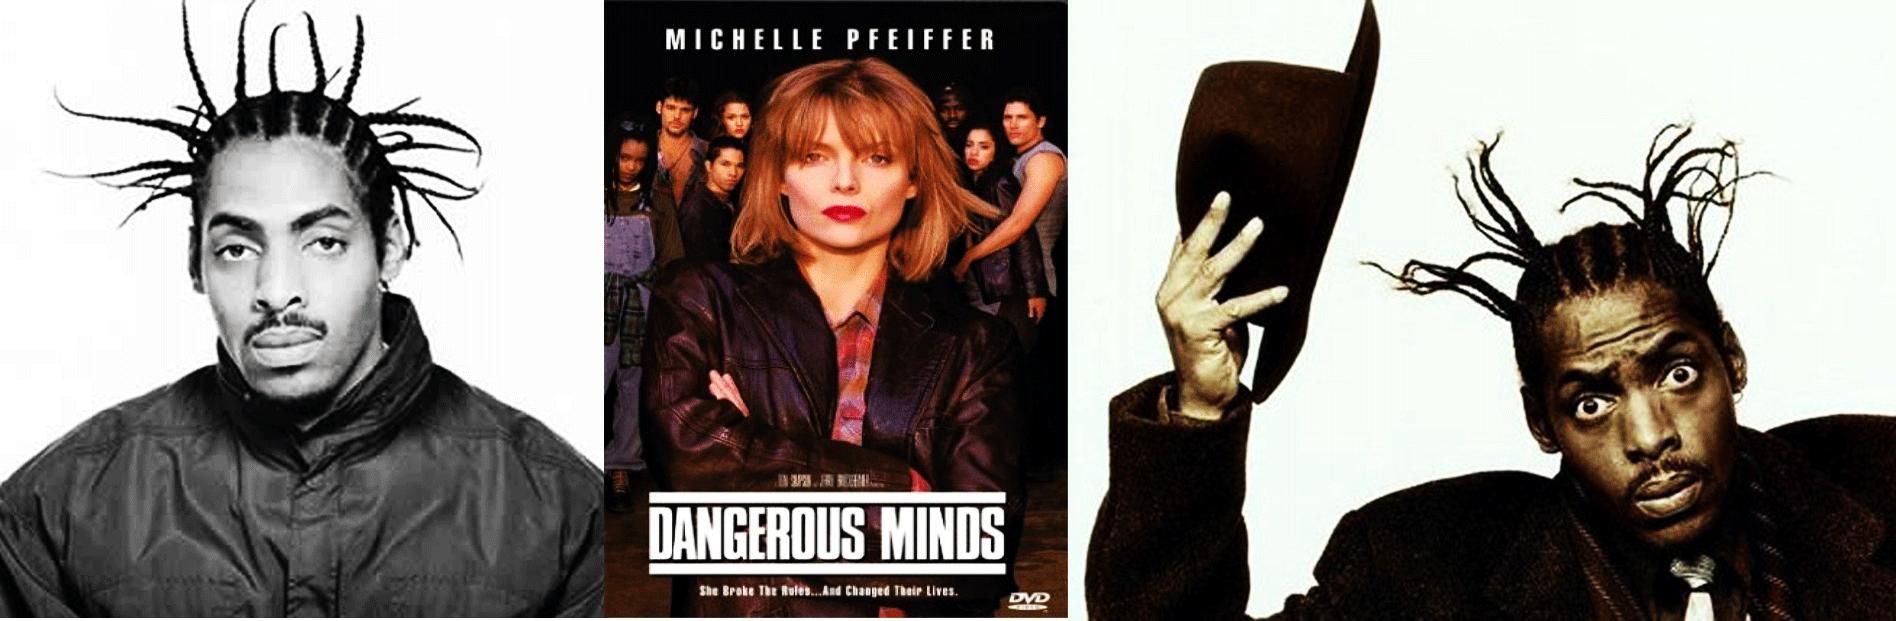 banda sonora mentes peligrosas